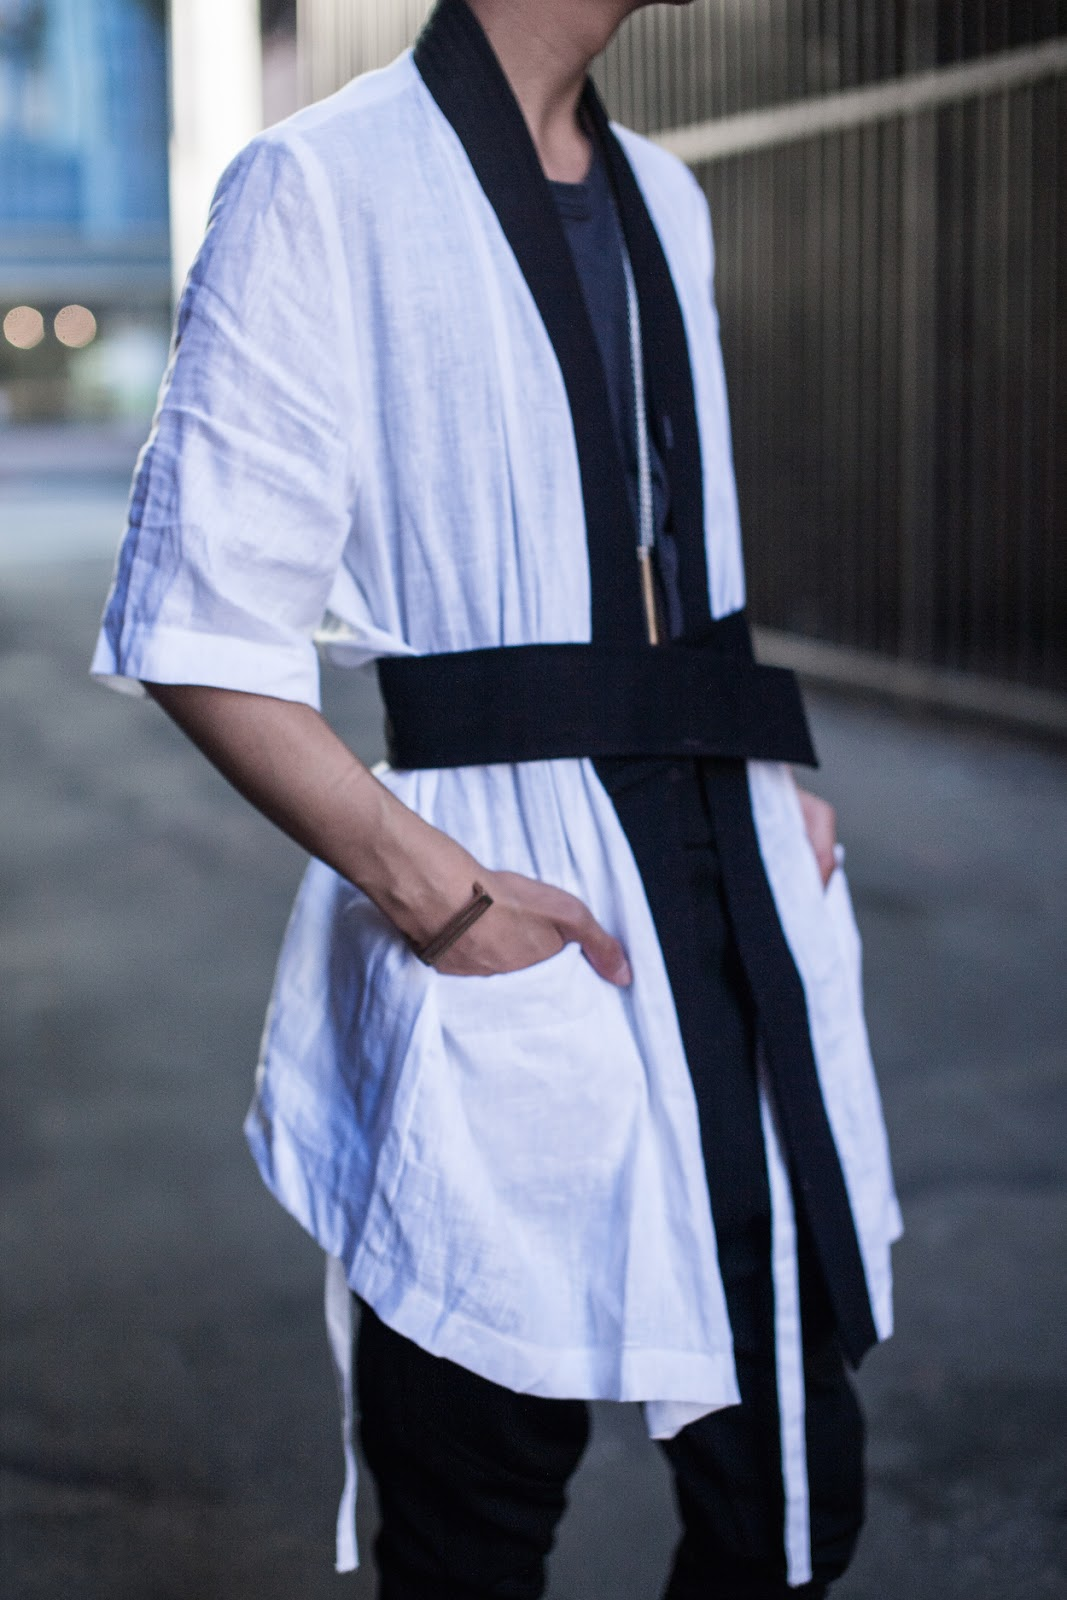 mybelonging-tommylei-menswearblogger-lura-brand-eyewear-3paradis-12.jpg